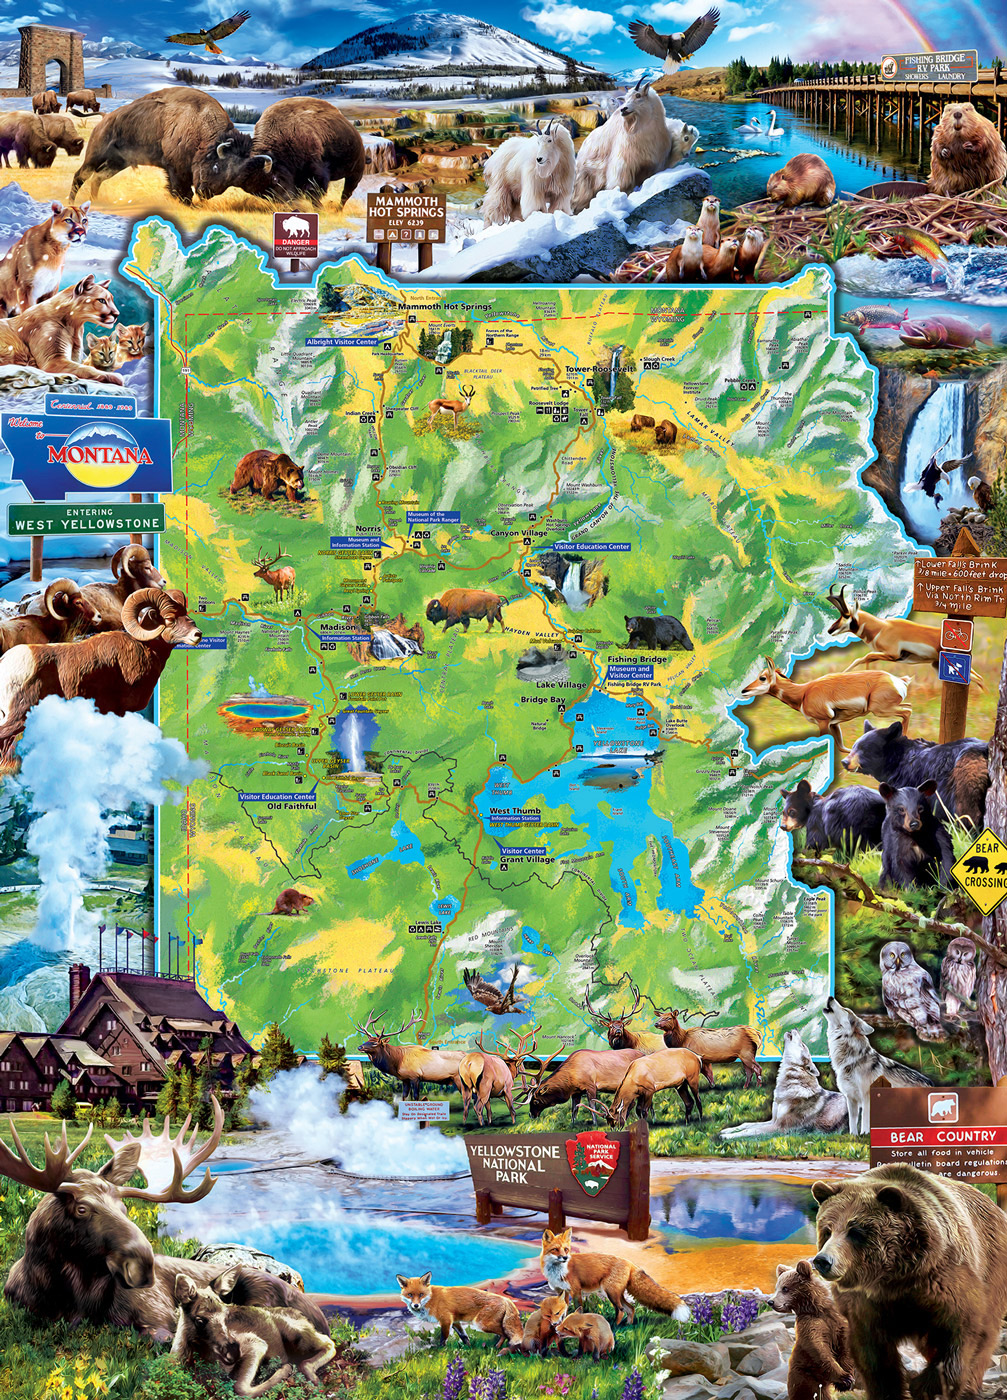 Yellowstone Maps / Geography Jigsaw Puzzle